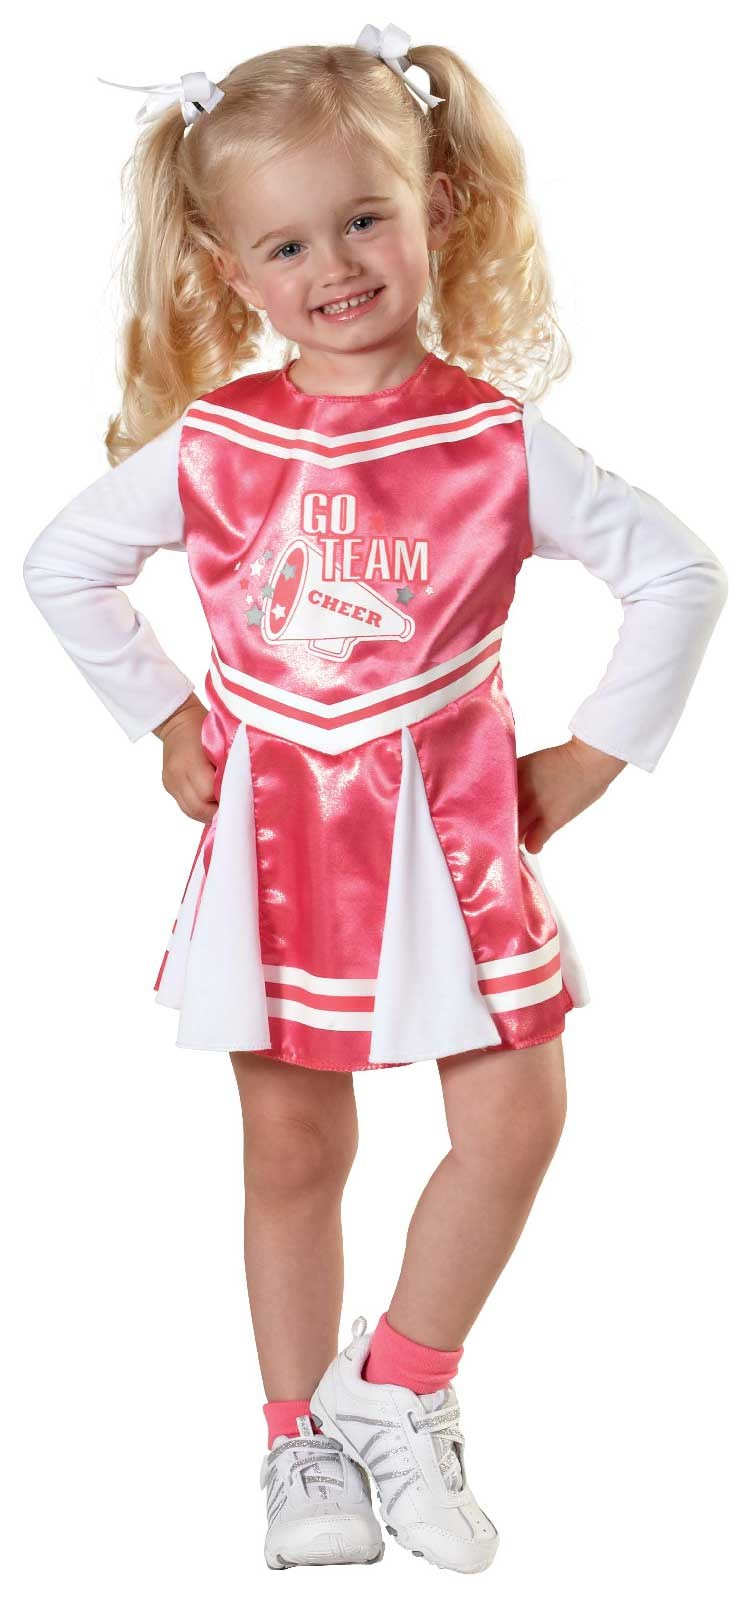 Cheerleader Toddler Costume